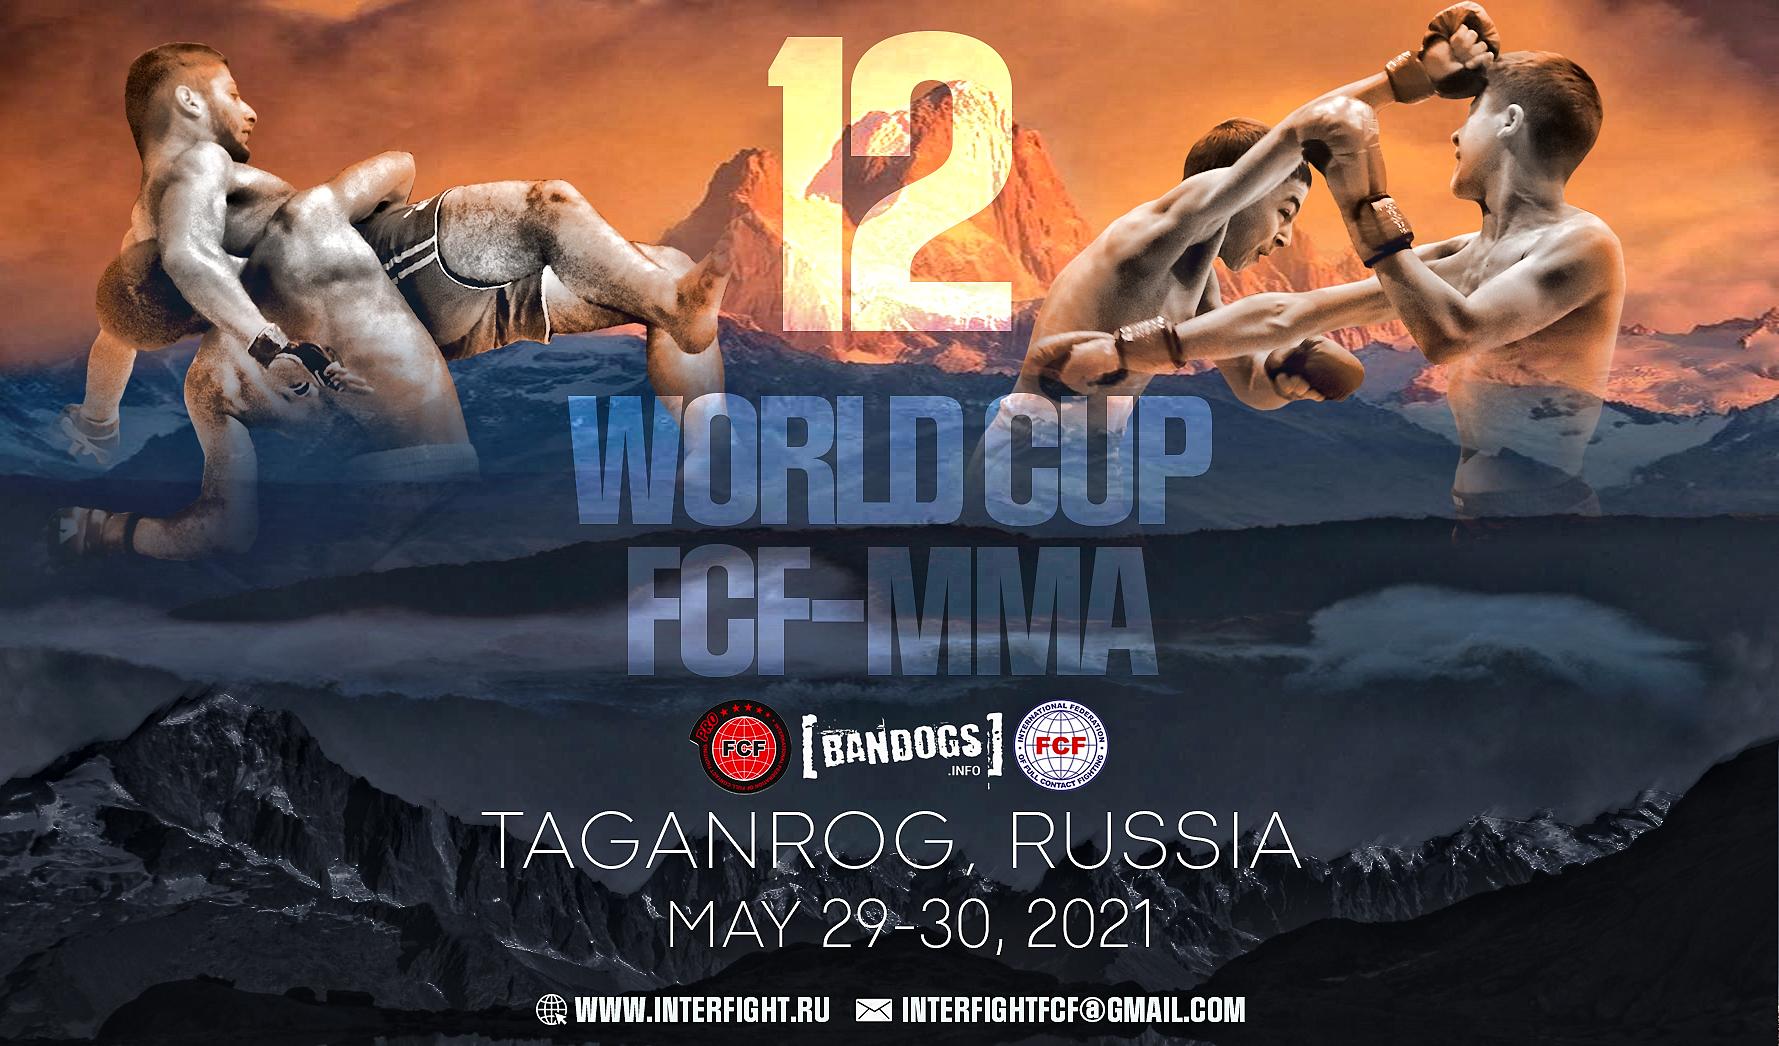 12th WORLD CUP FCF-MMA 2021